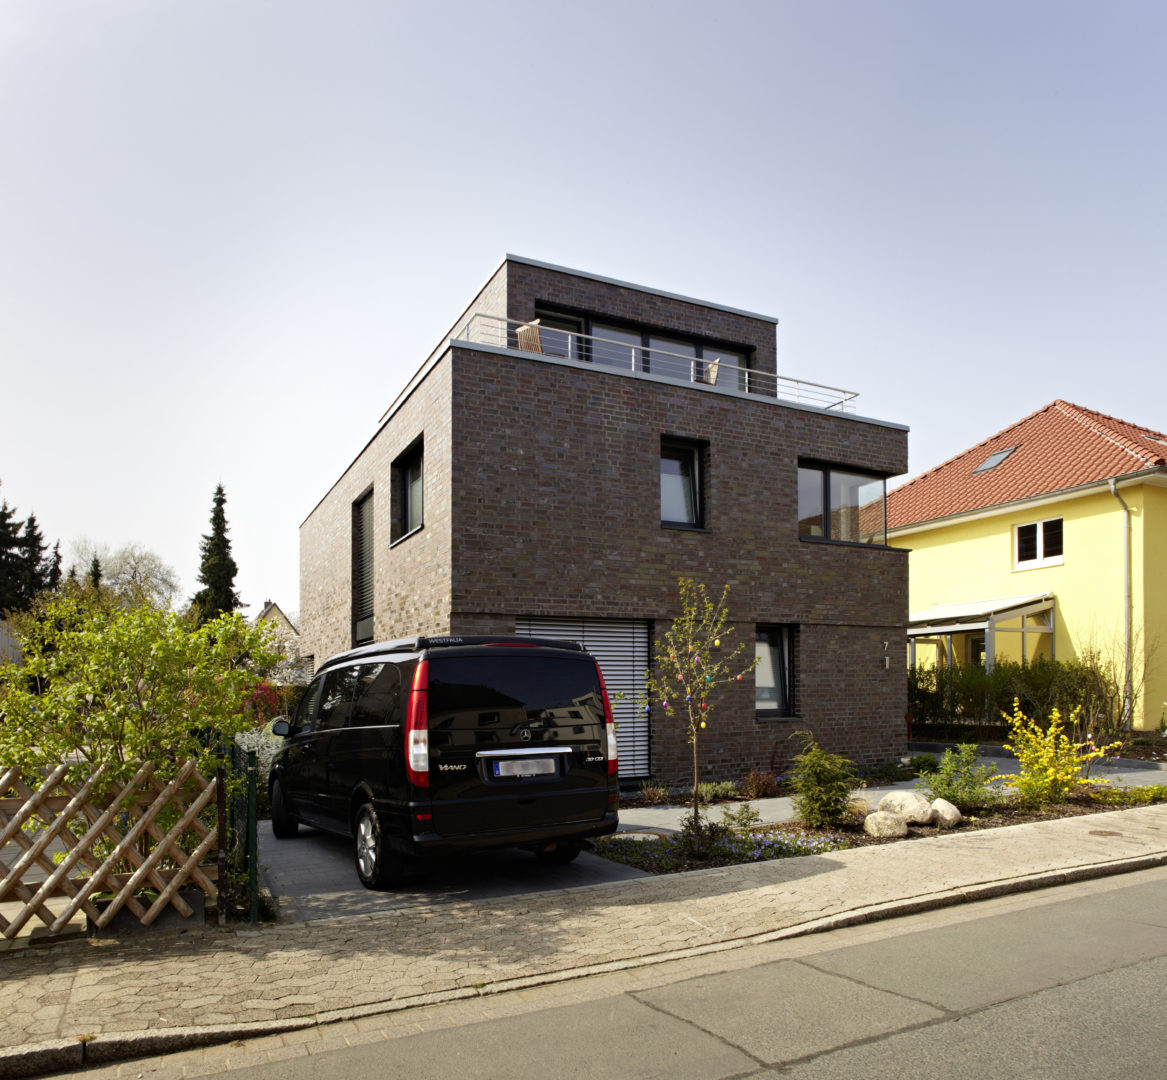 kubus mit staffelgeschoss neubau einer stadtvilla architekt fluegge beratung planung. Black Bedroom Furniture Sets. Home Design Ideas